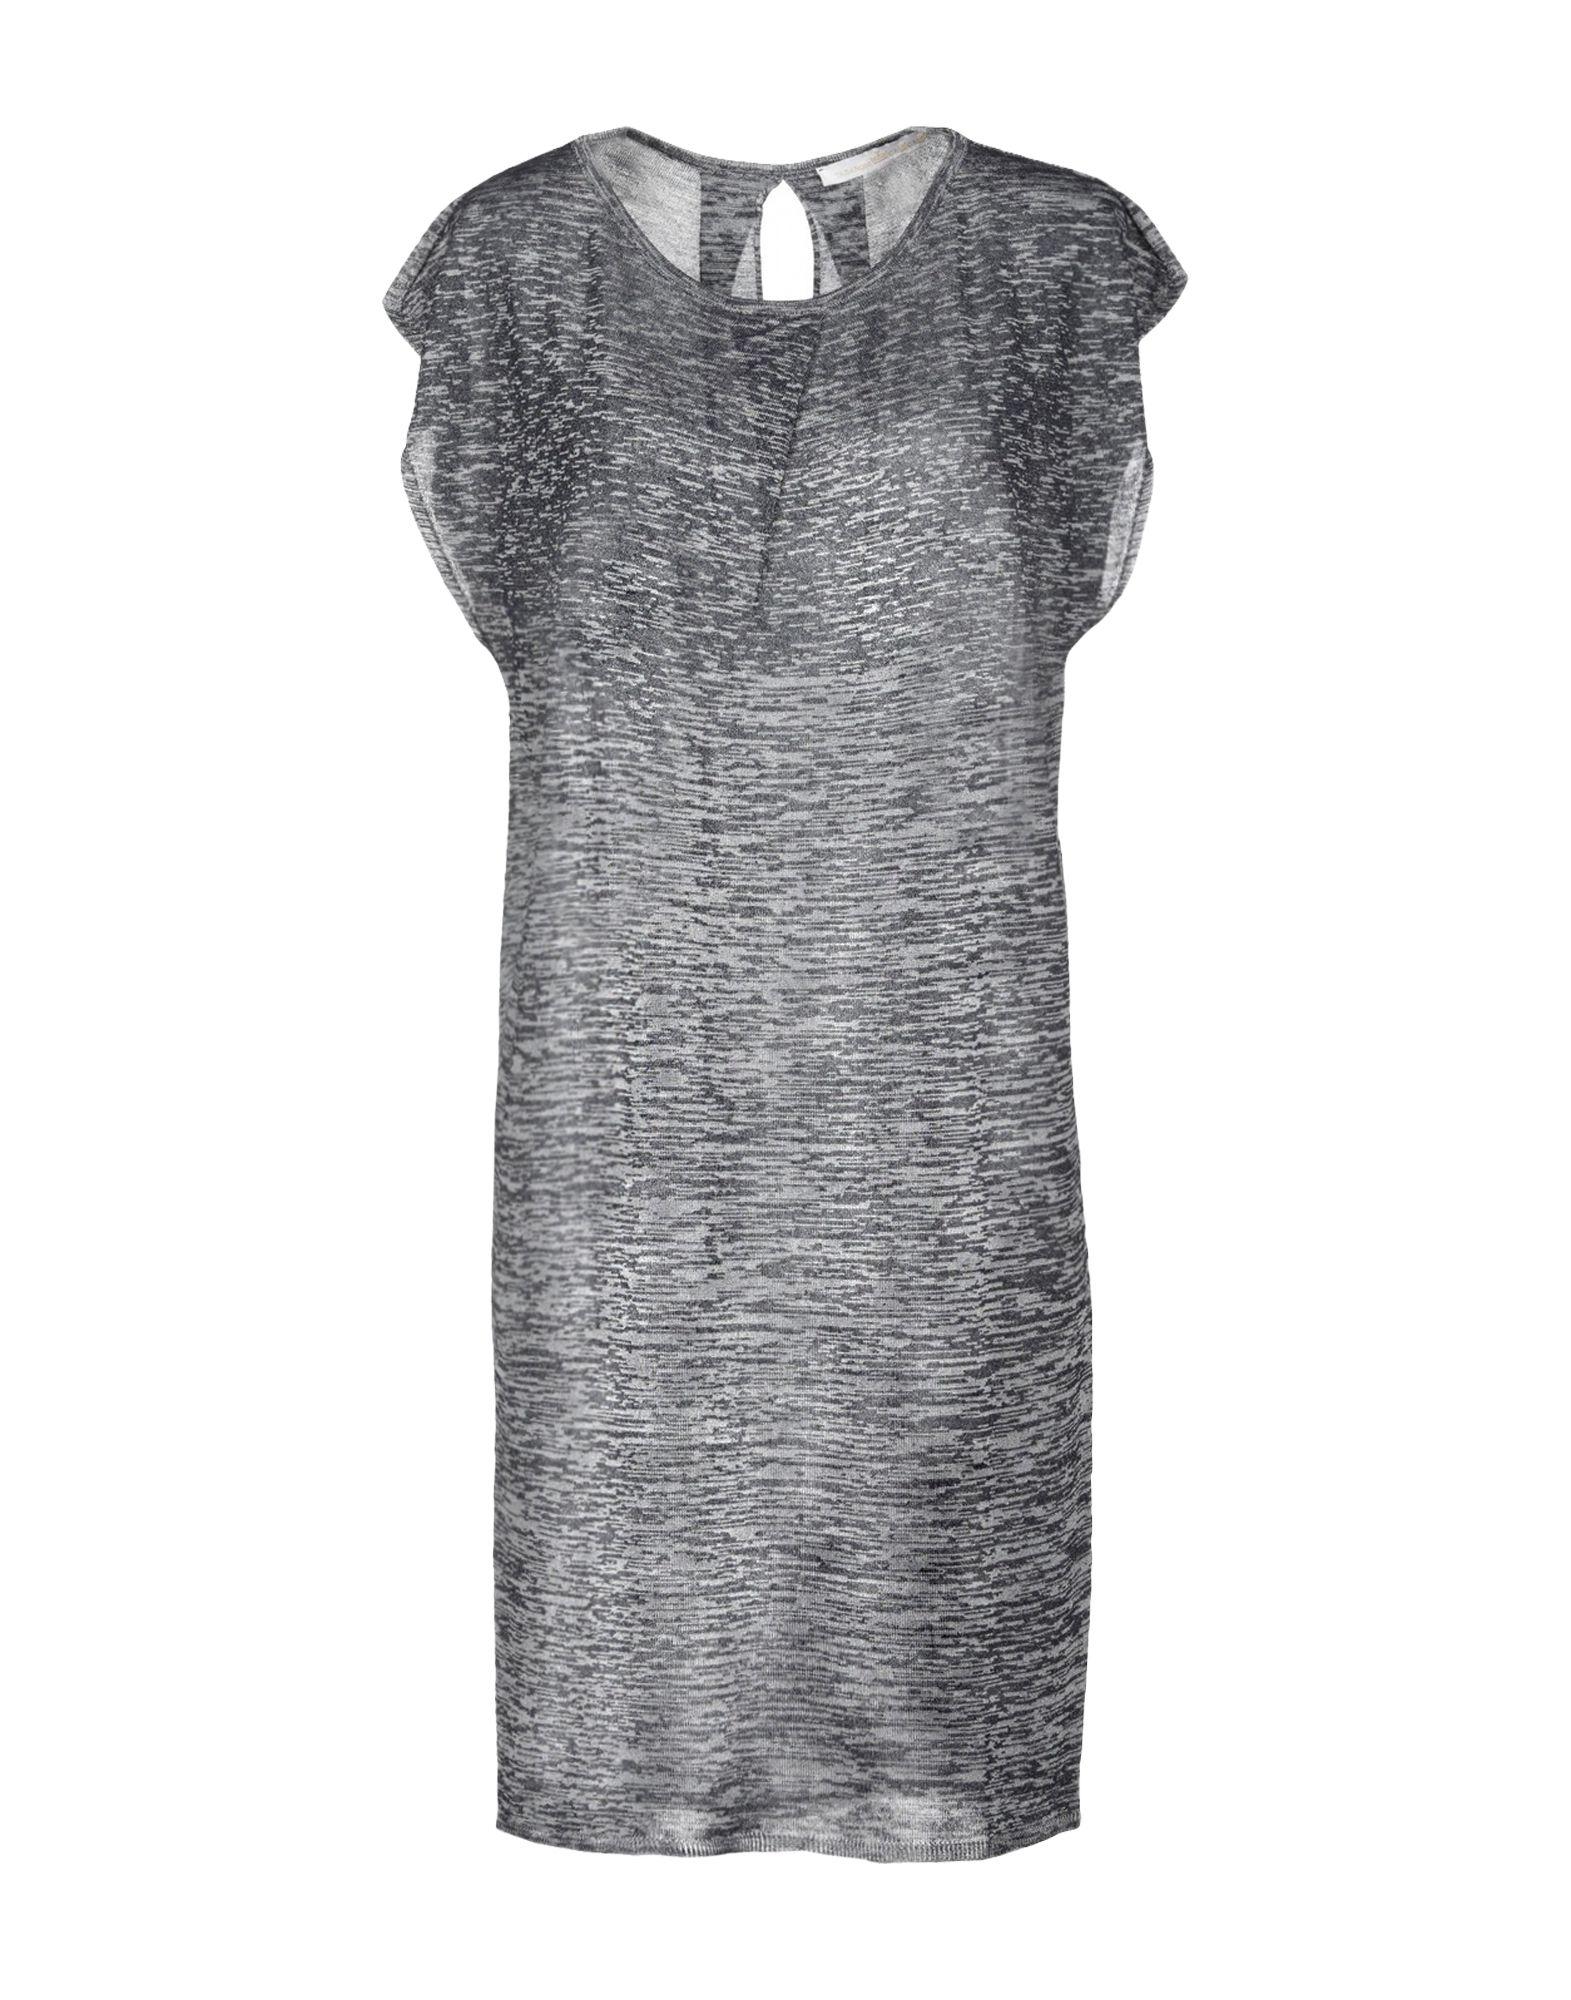 TABARONI CASHMERE Короткое платье